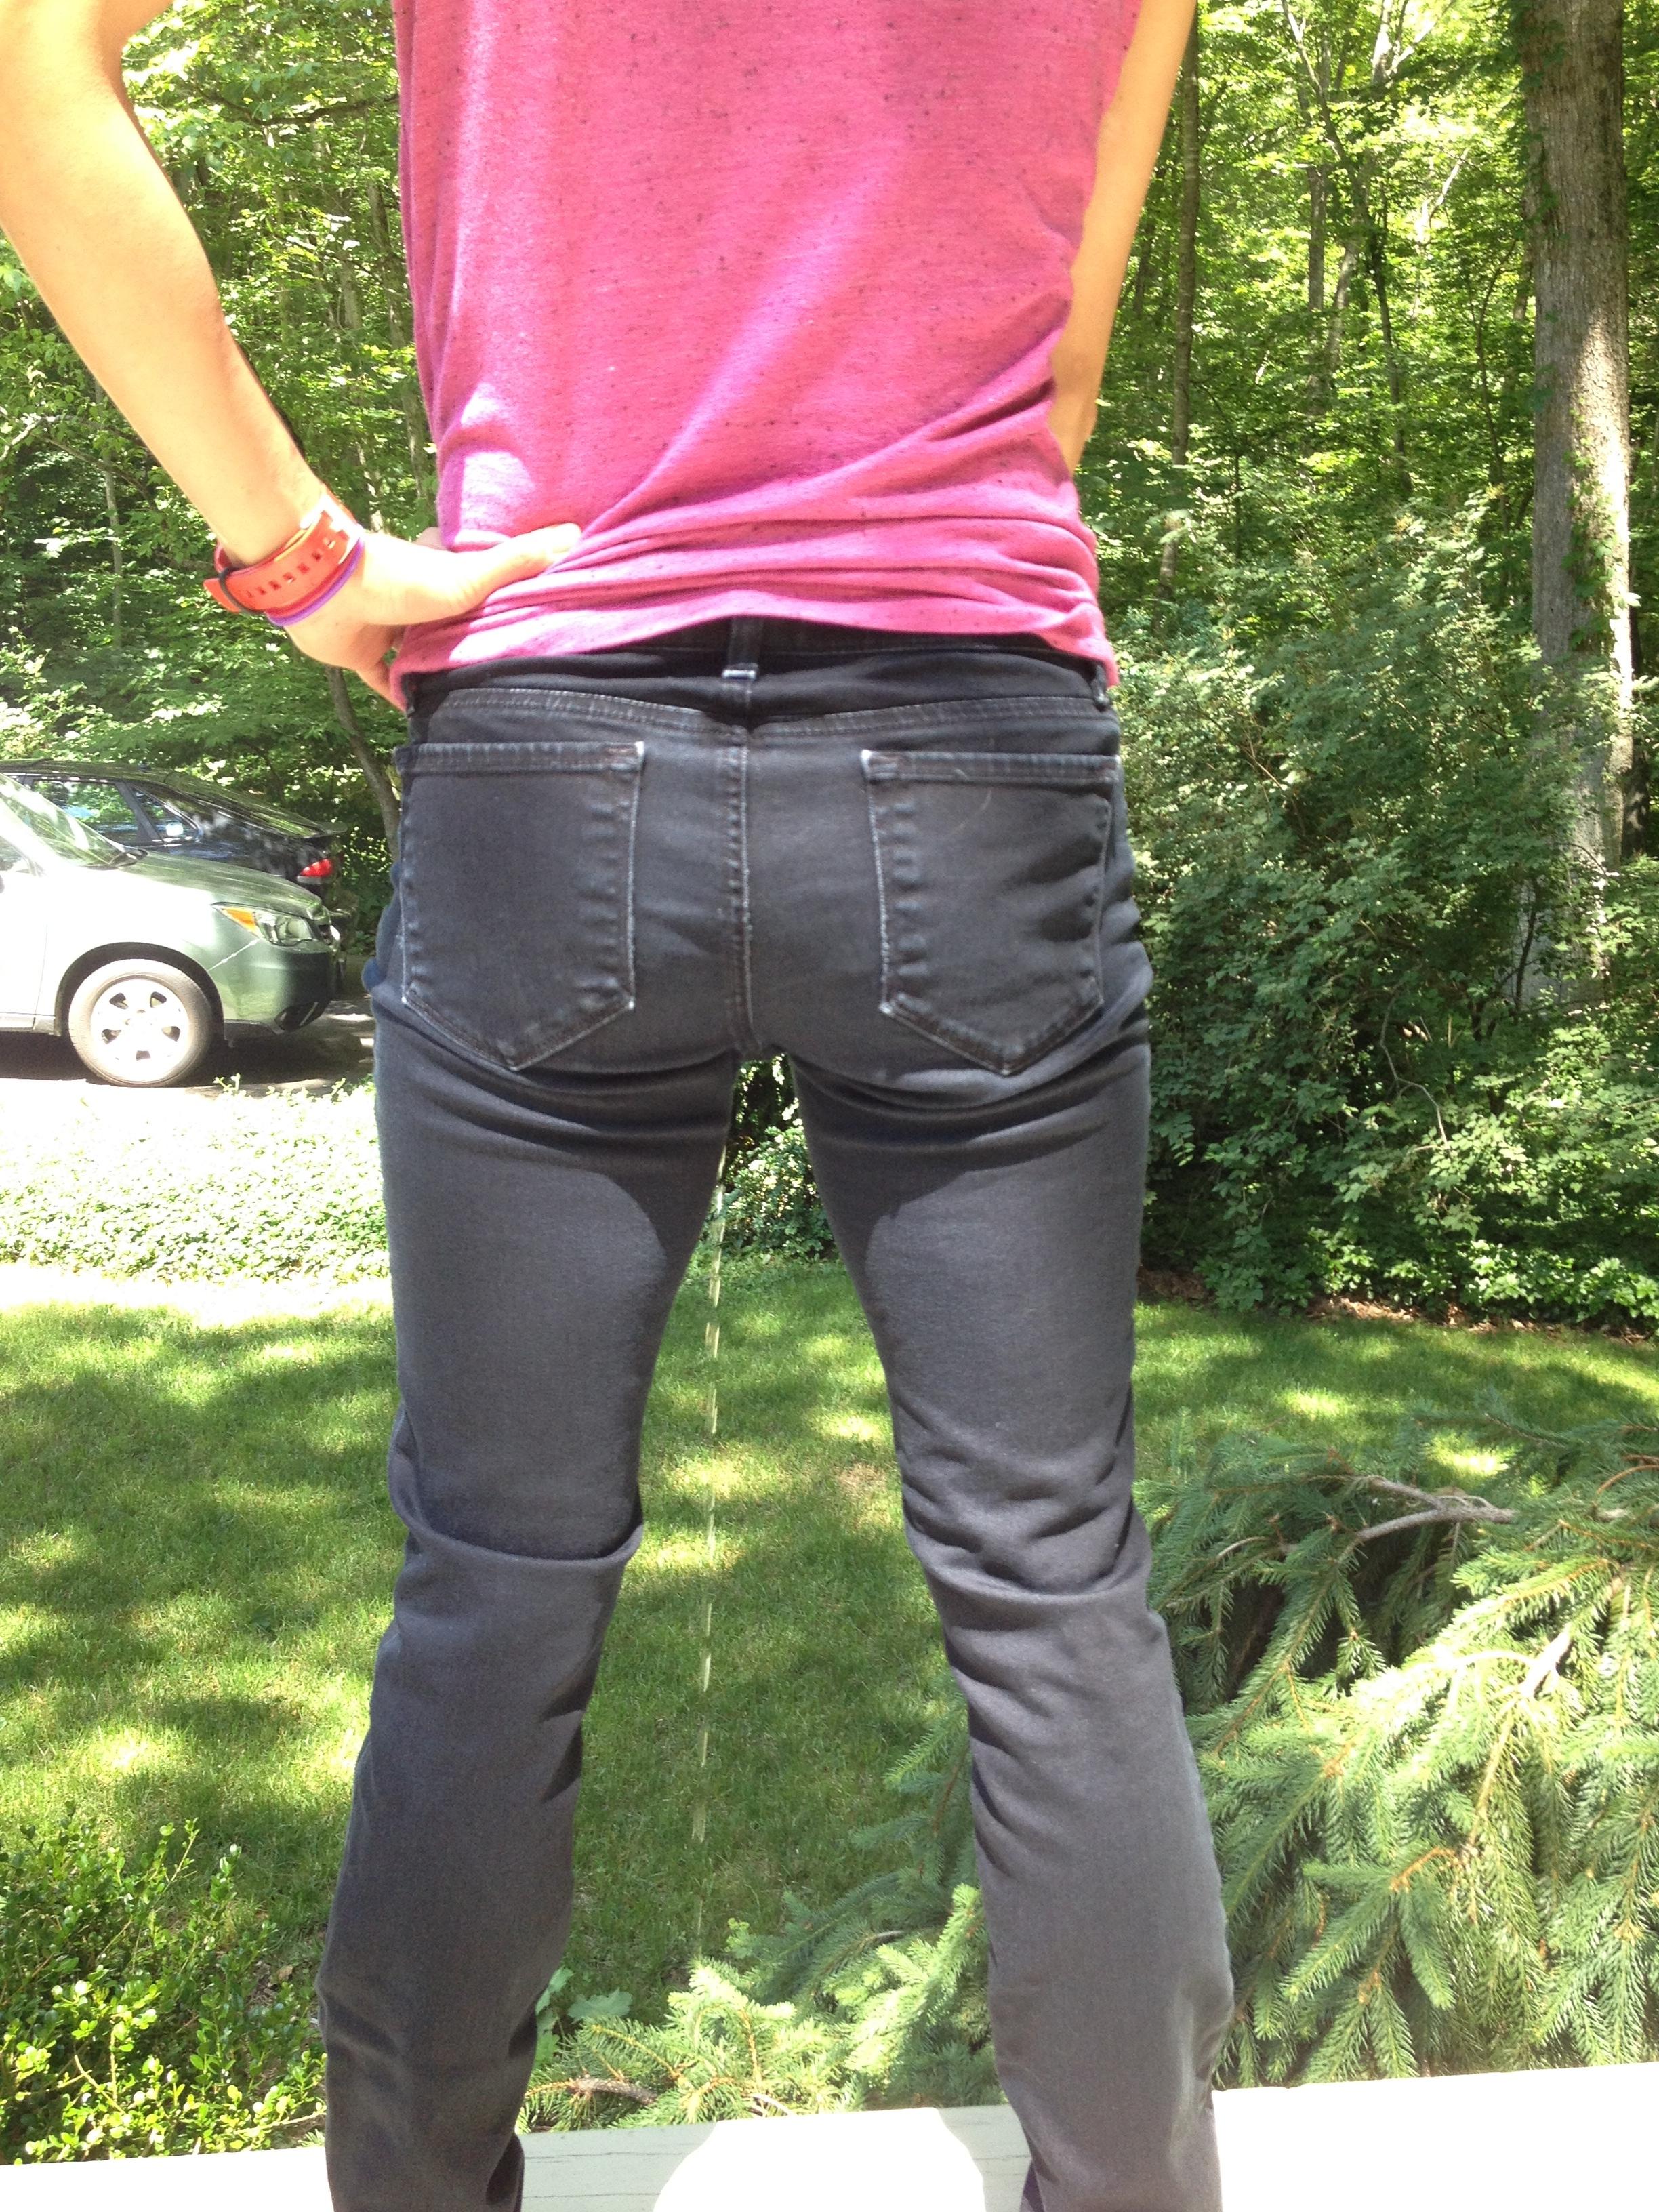 girls piss in pants